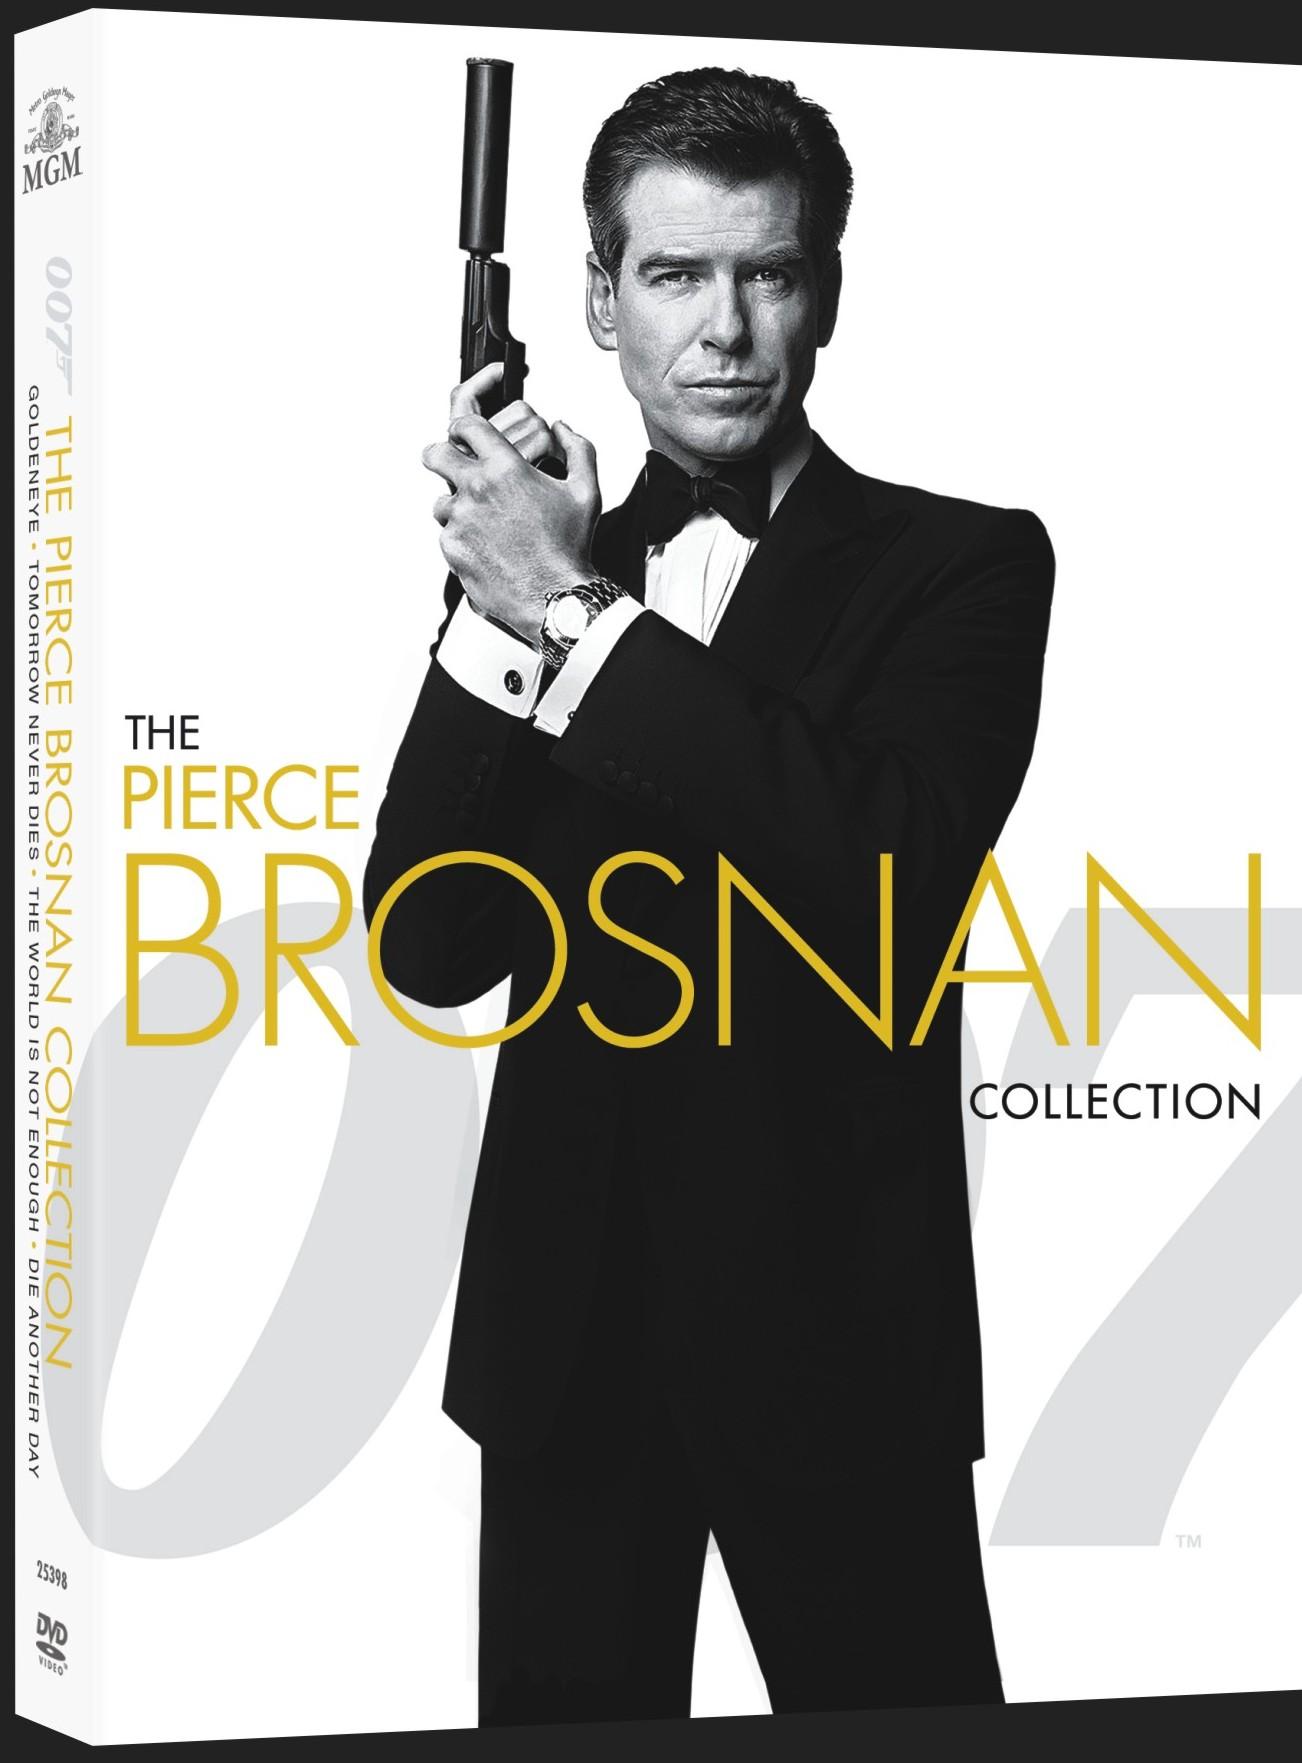 JAMES BOND: PIERCE BROSNAN - KOLEKCE - 4 DVD